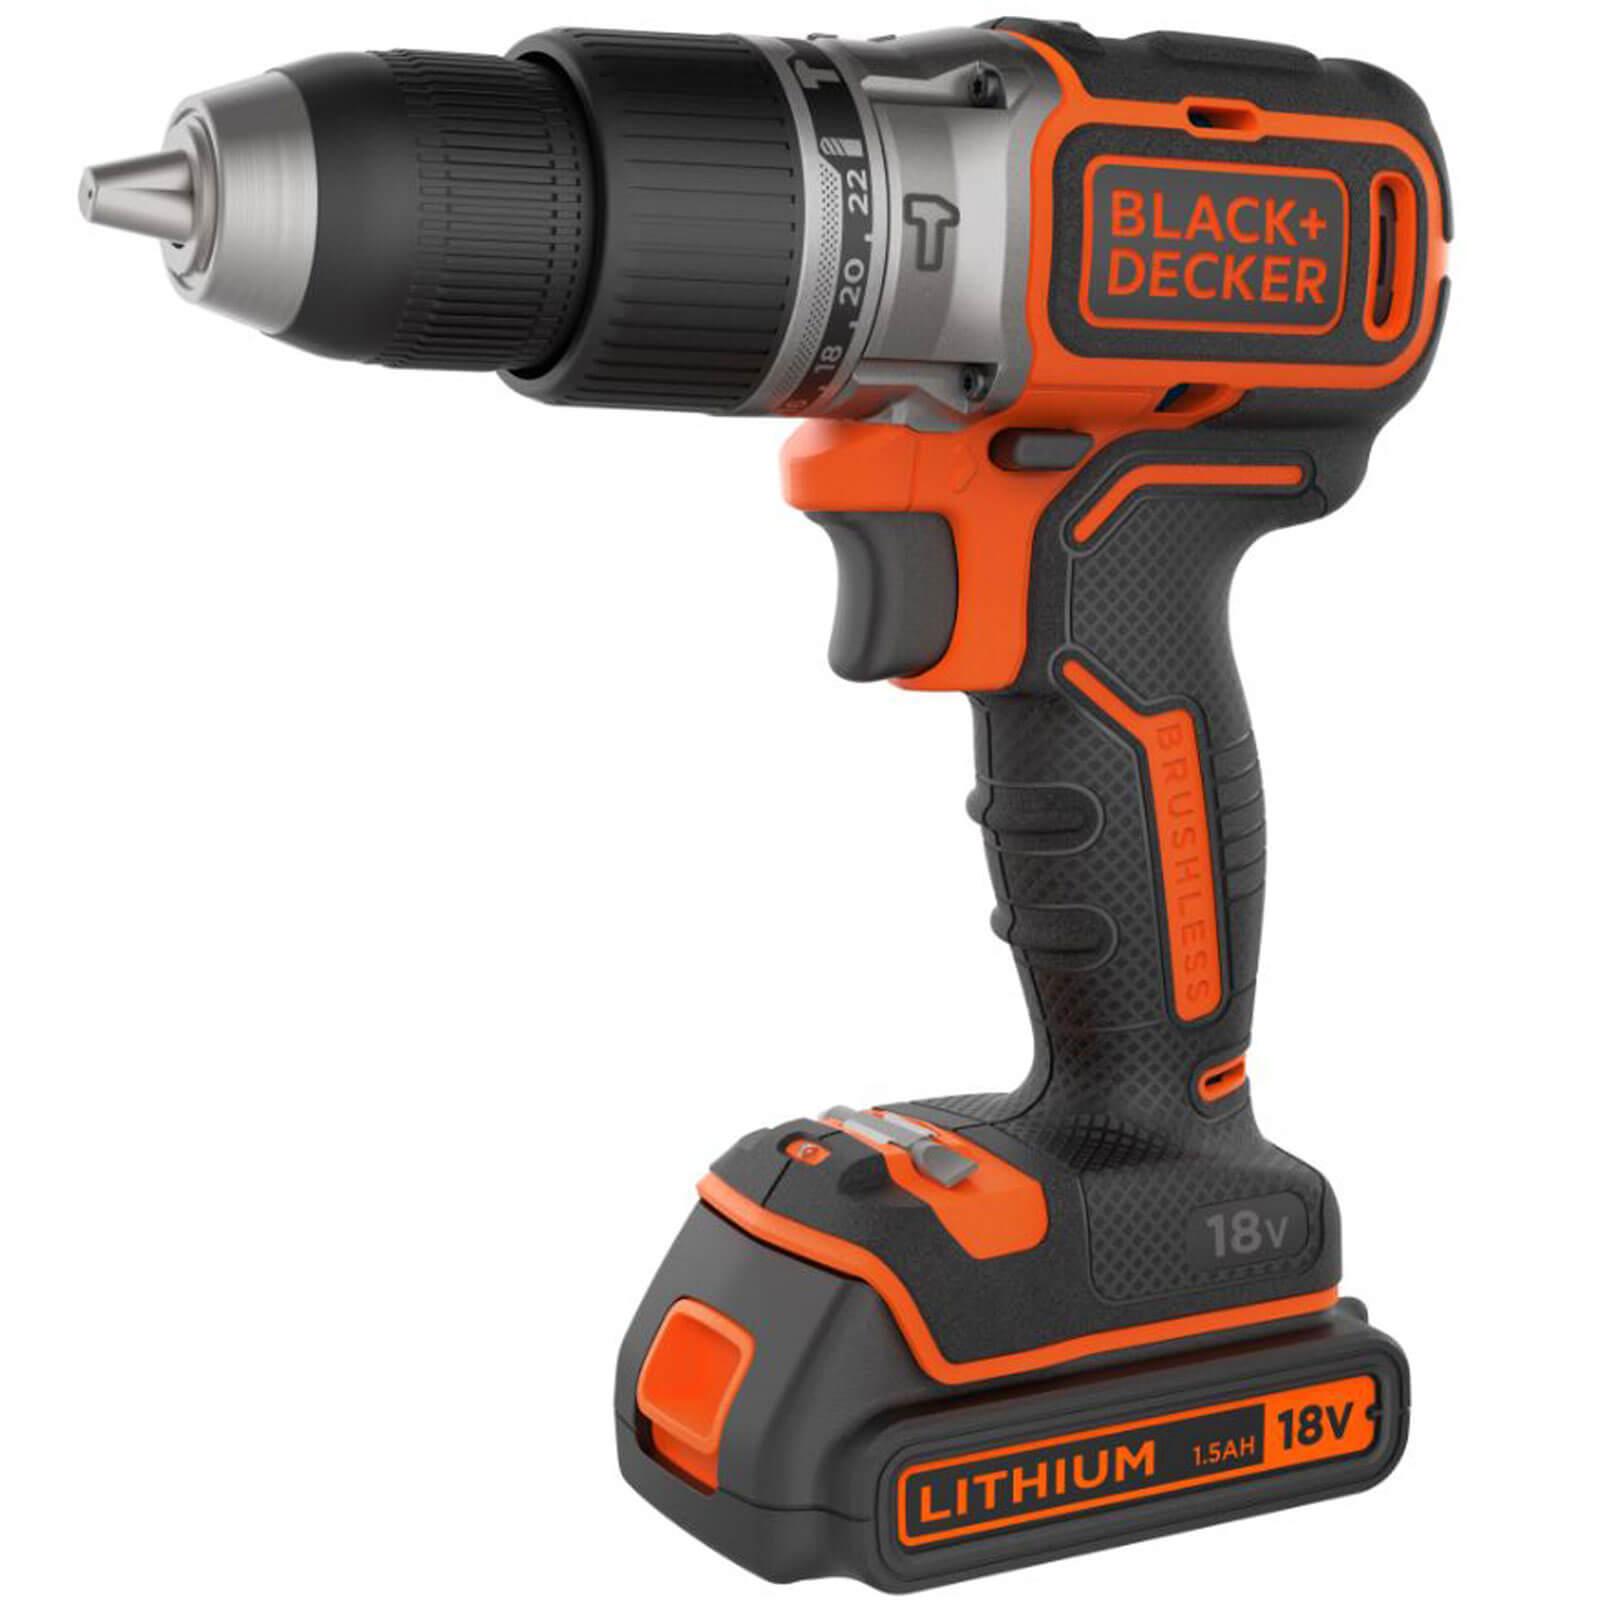 Black & Decker BL188 18v Cordless Combi Drill 1 x 1.5ah Liion Charger No Case